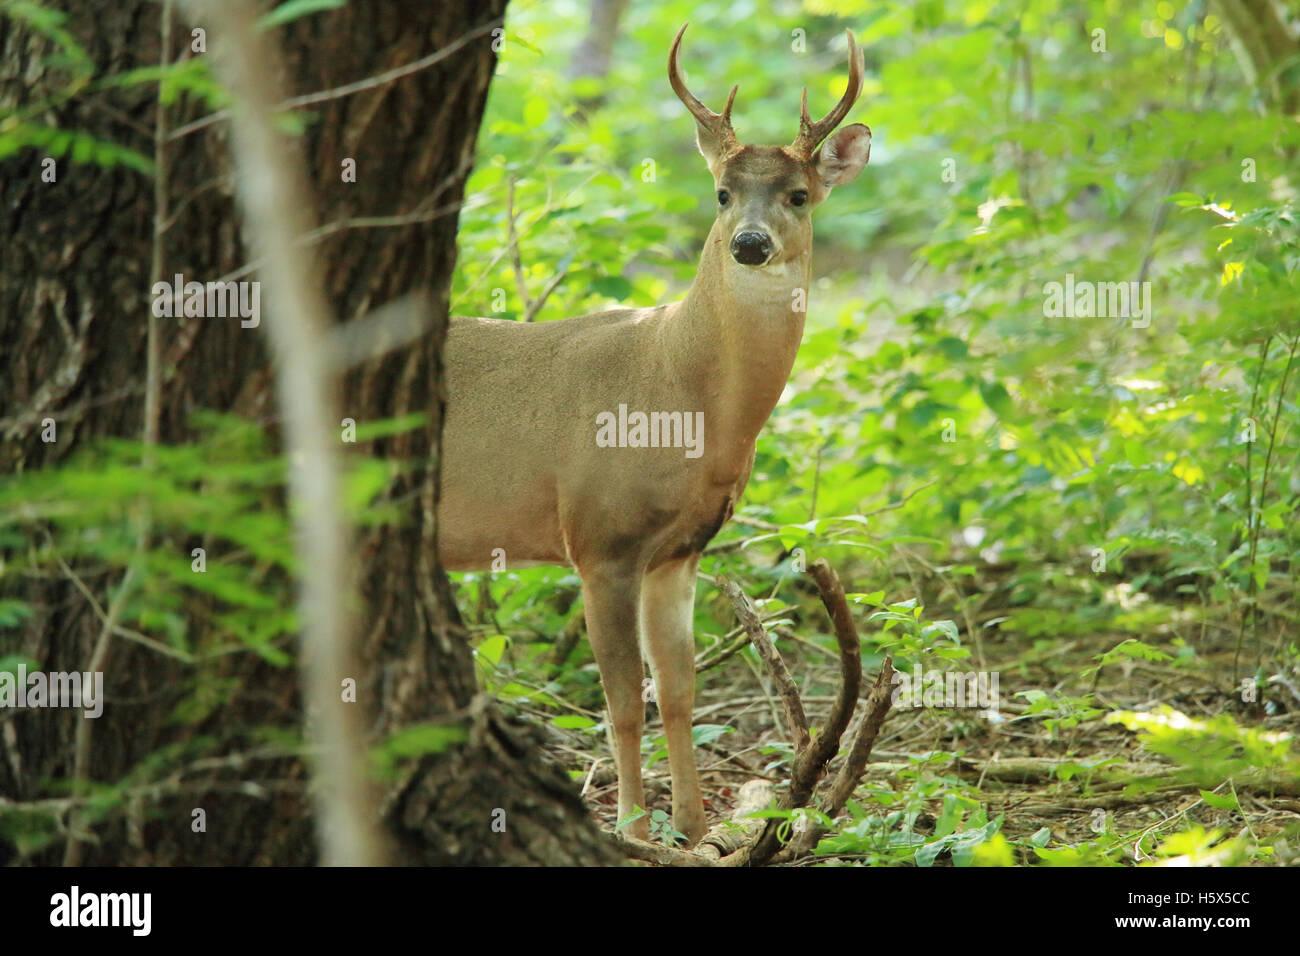 Male White-tailed deer (Odocoileus virginianus). Tropical dry forest, Santa Rosa National Park, Guanacaste, Costa Rica. Stock Photo